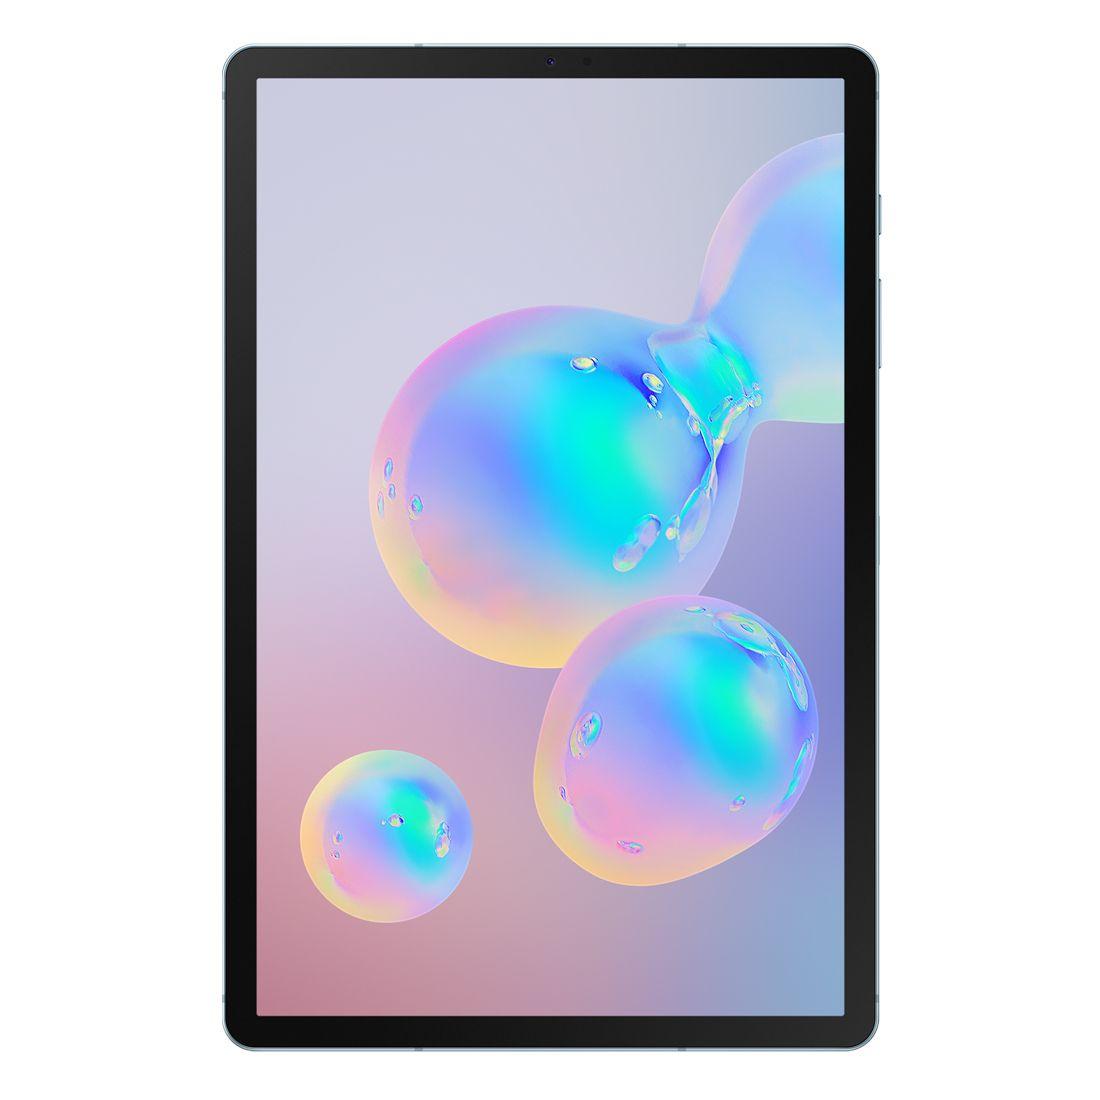 "Samsung Galaxy Tab S6 (128GB/6GB, 10.5"", Wi-Fi with S-Pen) - Cloud Blue"